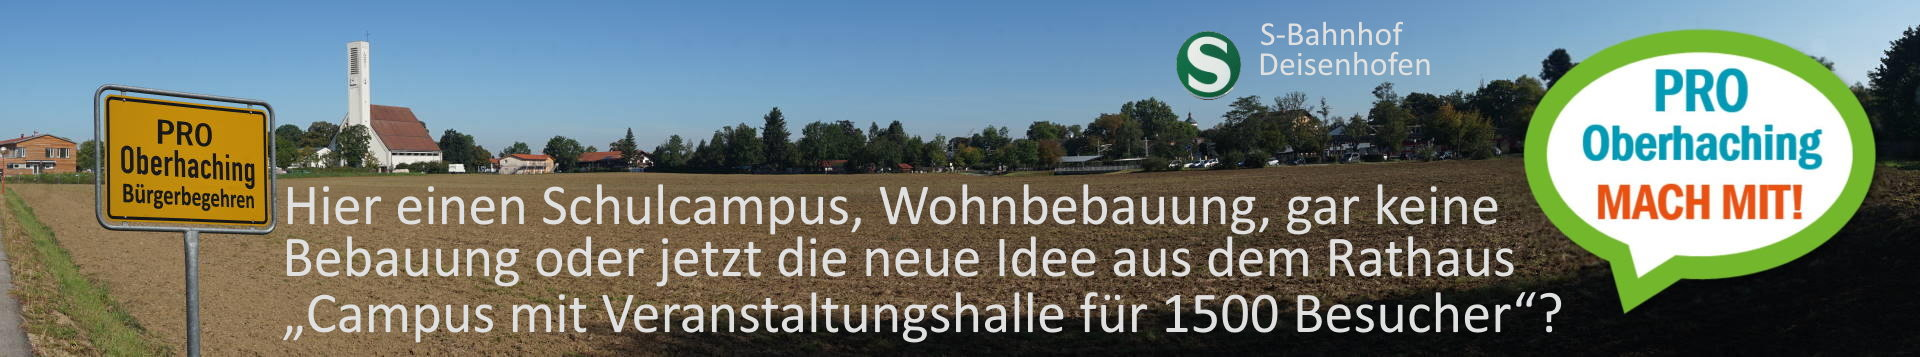 PRO Oberhaching